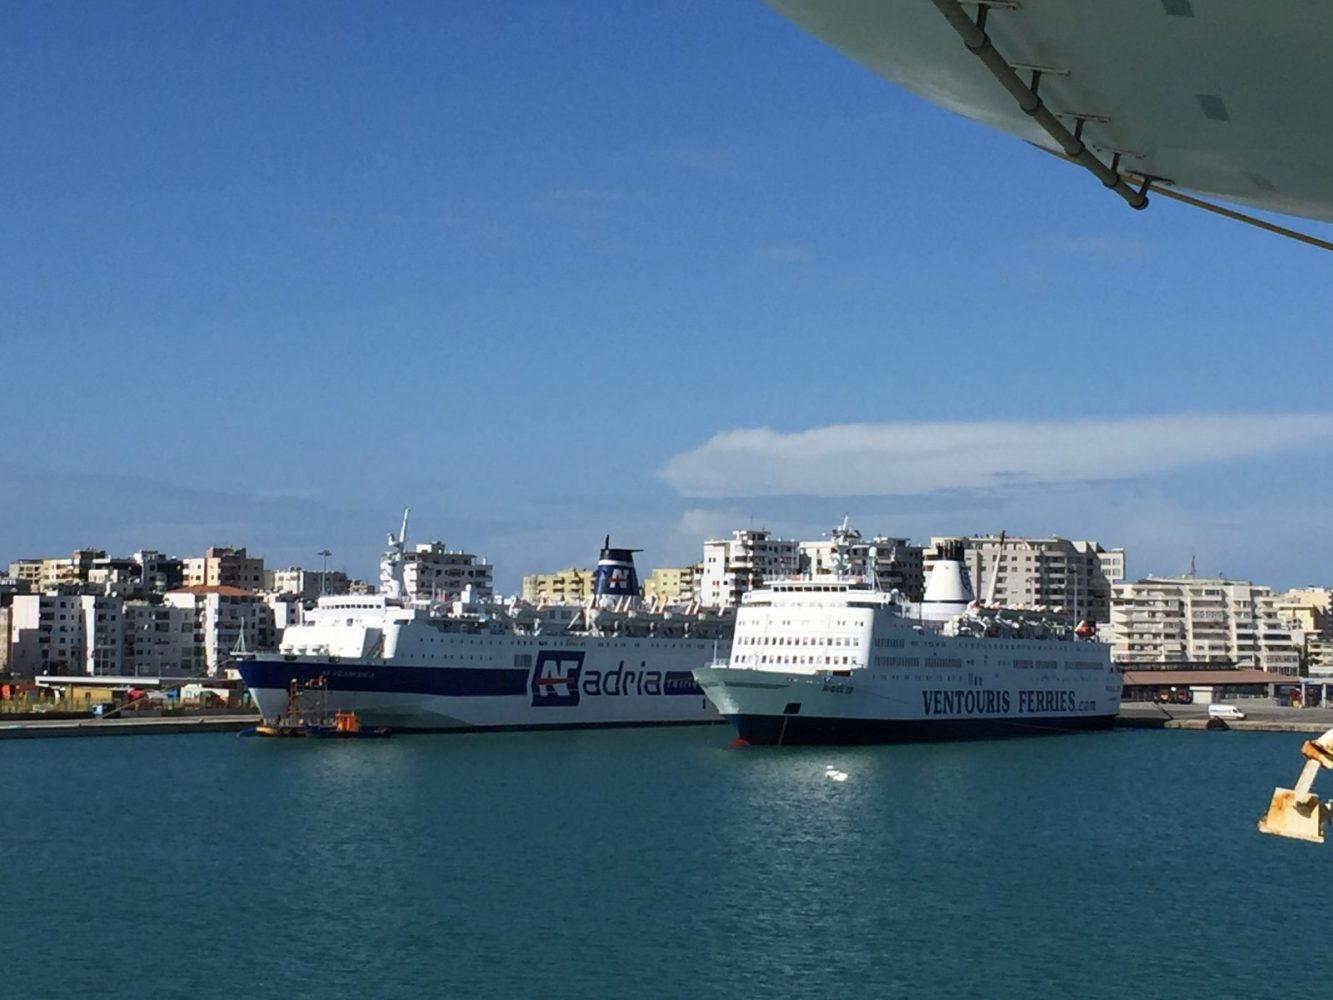 European Ferries; The Great Grimaldi Line